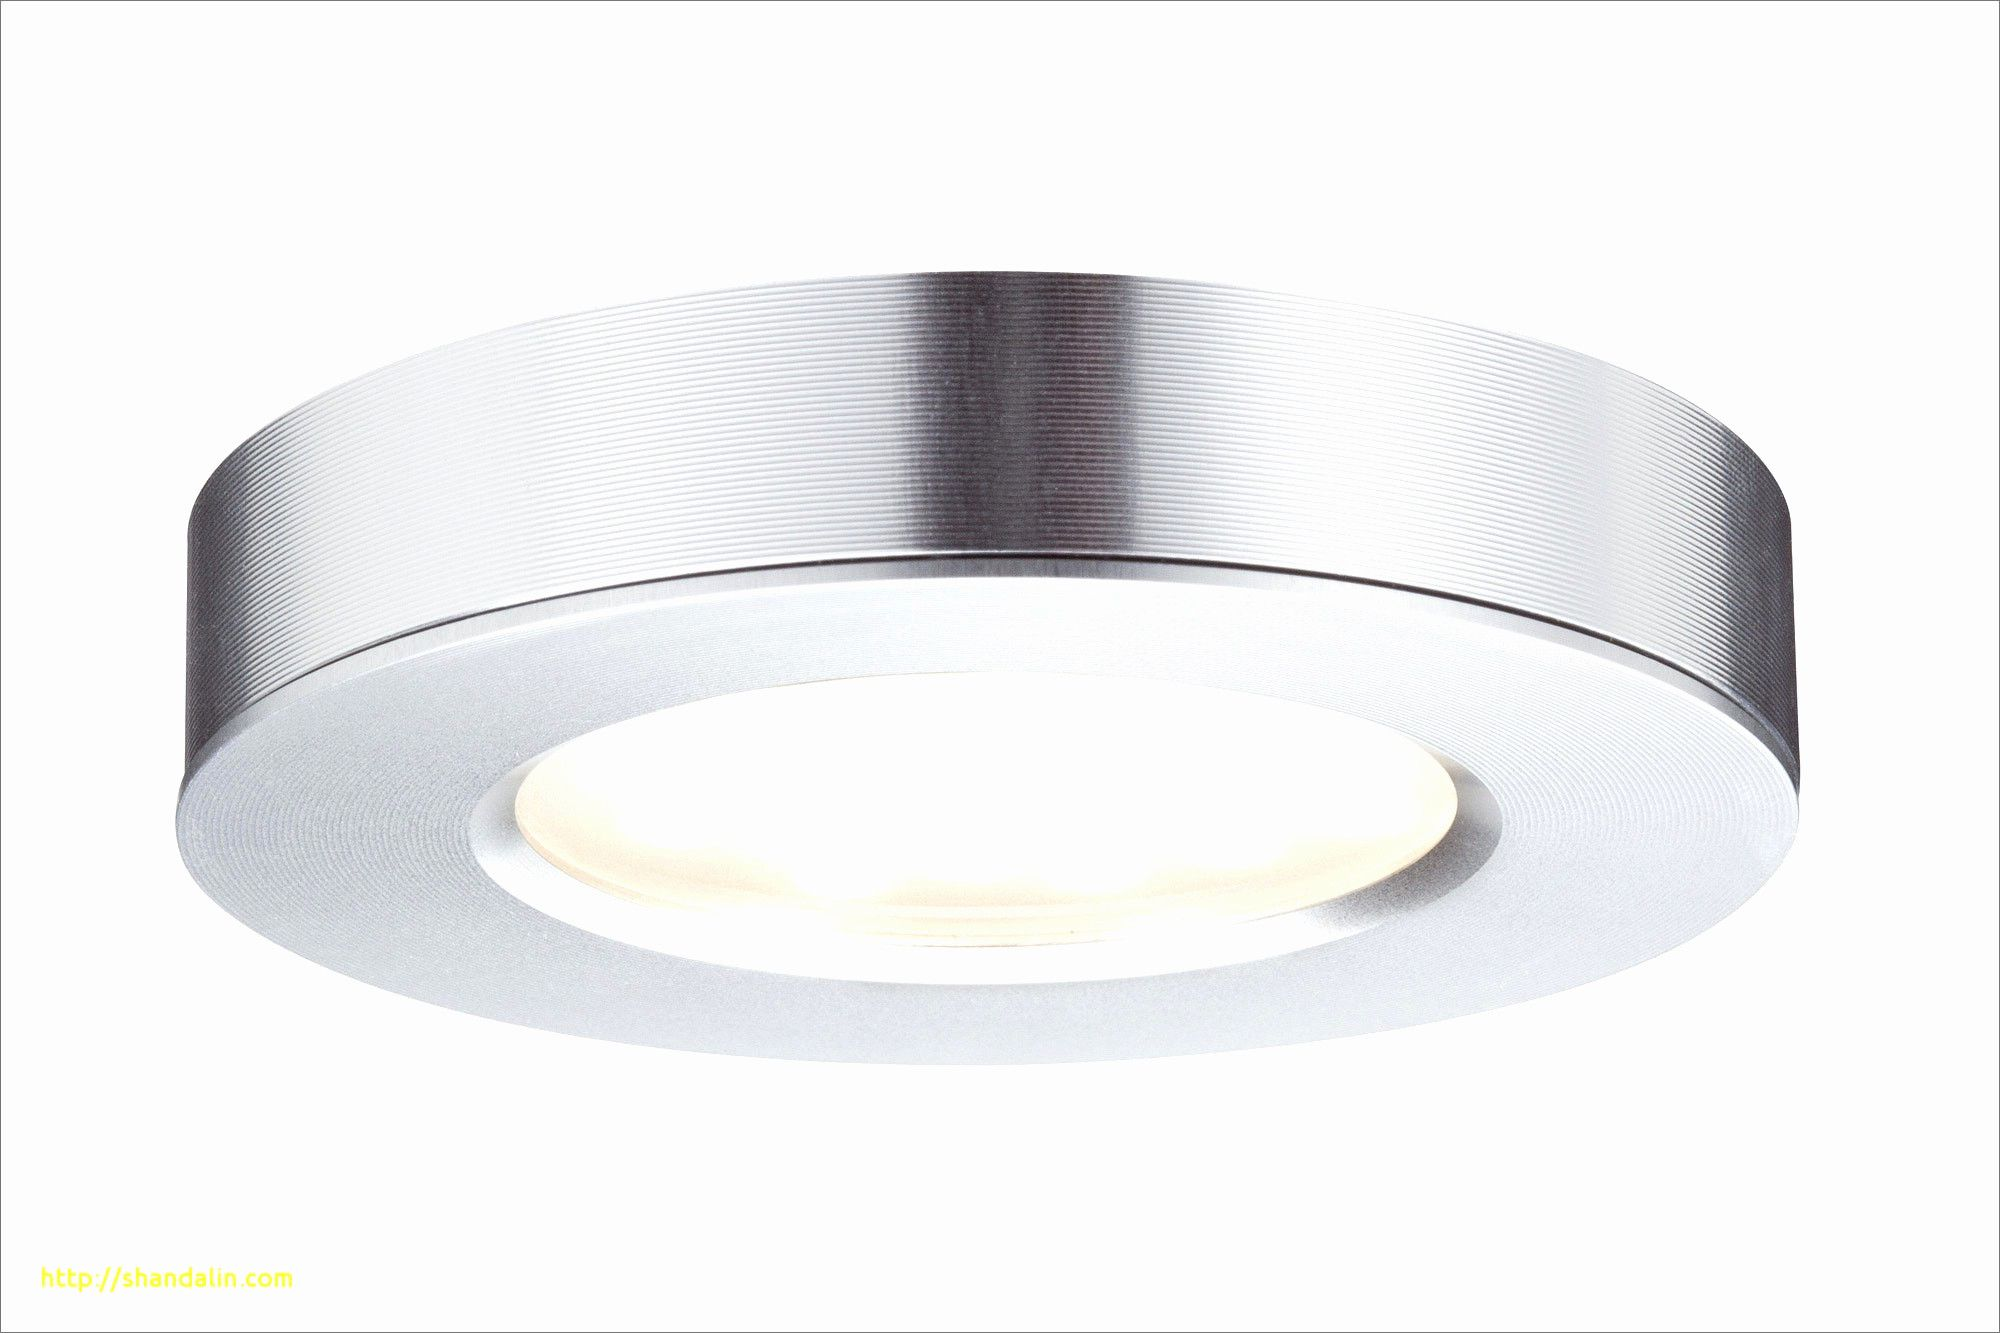 Luxury Spot Led Encastrable Plafond Extra Plat 220v Led Lamp Lamp Light